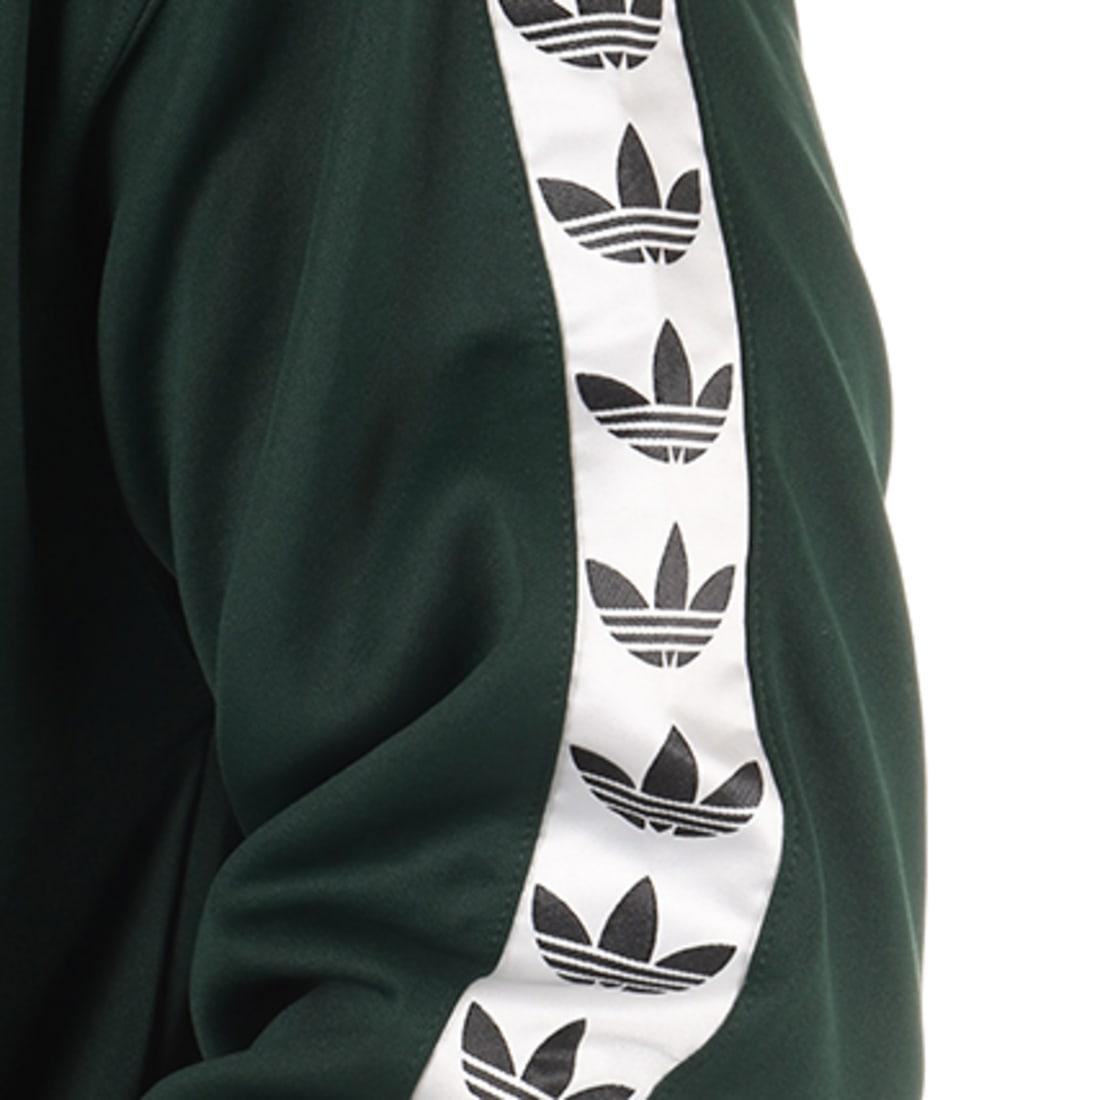 adidas Originals TNT Tape Hoodie | Bleu | Pull over à